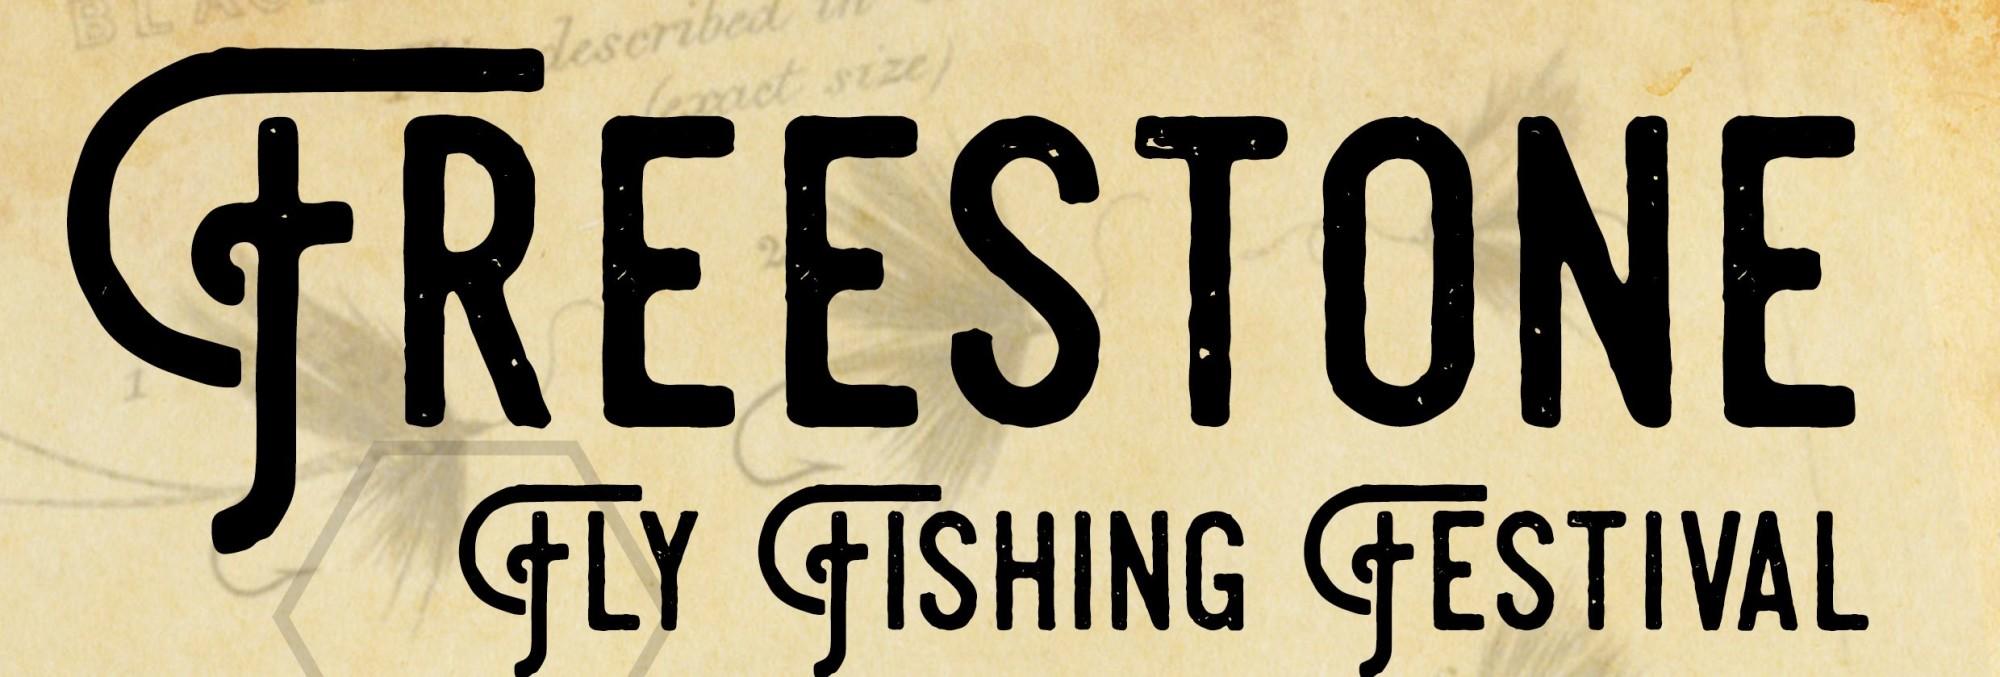 Am 28. Oktober 2017 um 14 Uhr beginnt das Freestone Fly Fishing Festival.